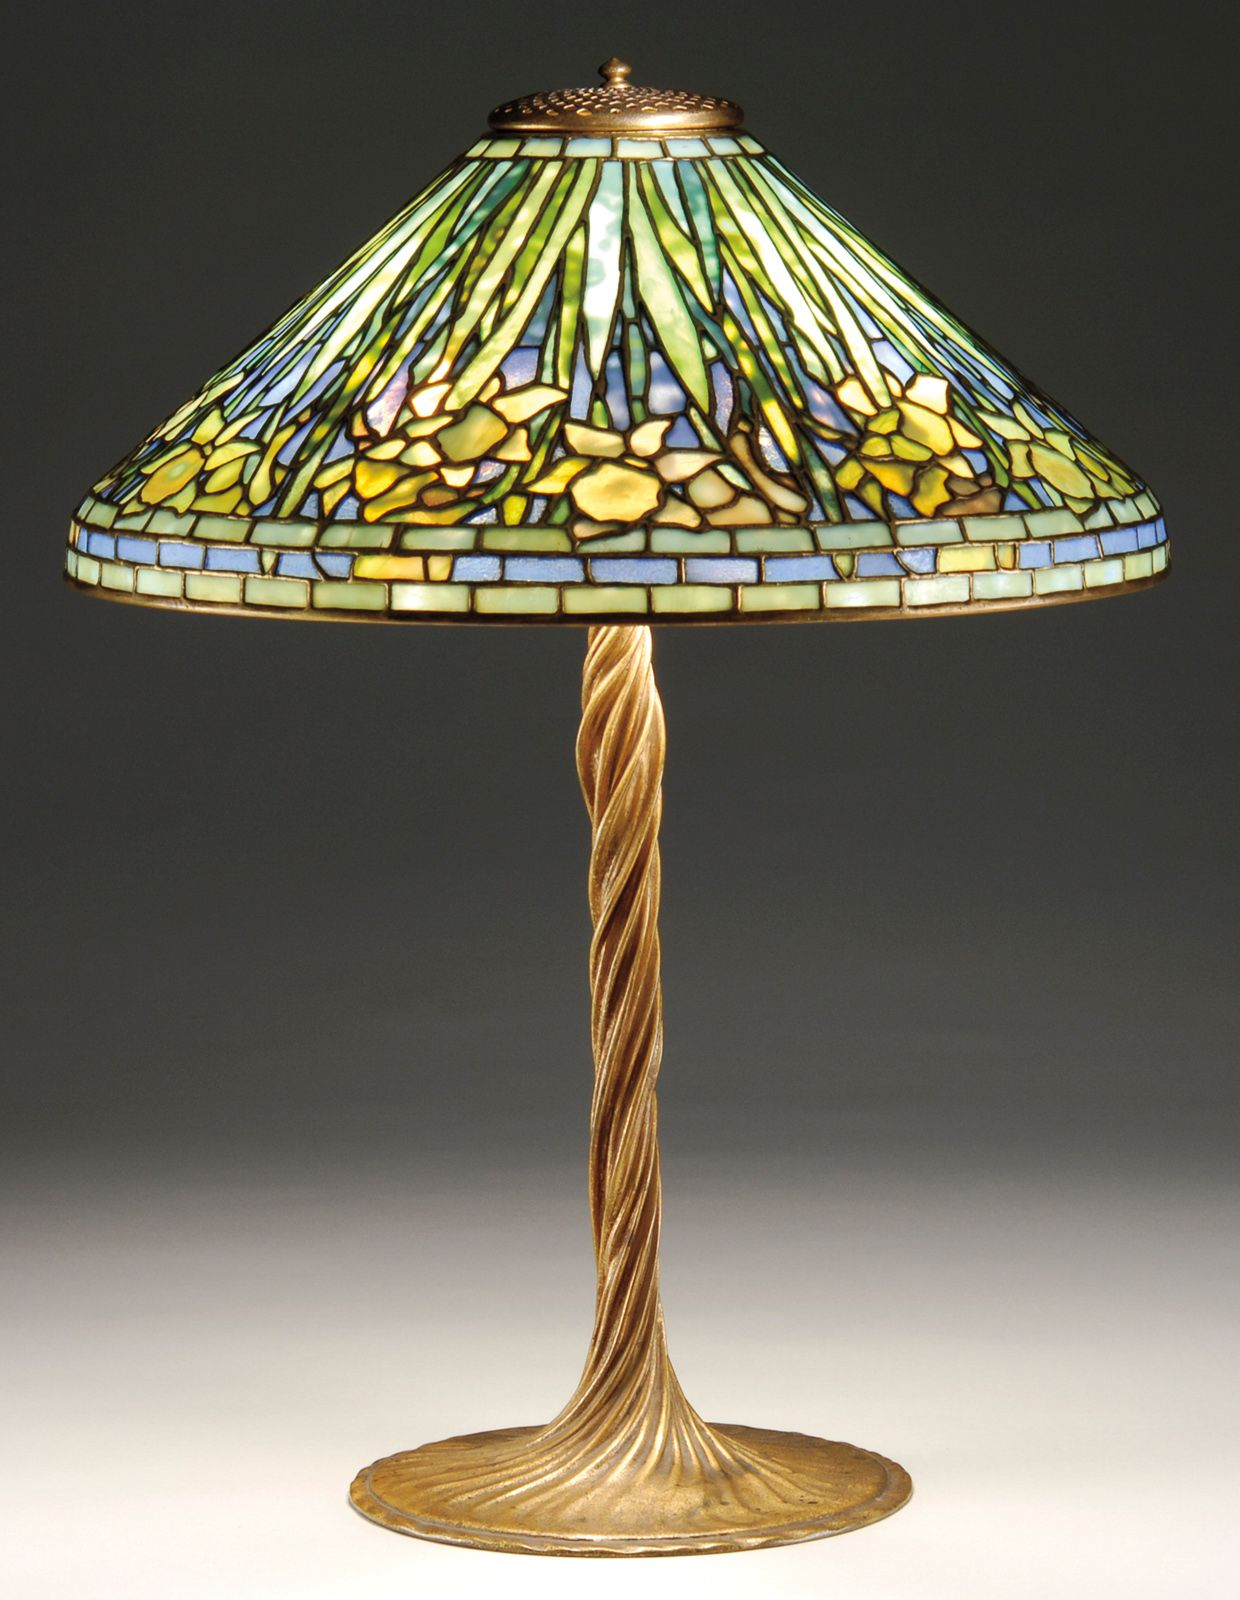 A beautiful daffodil table lamp on its original twisted vine base.